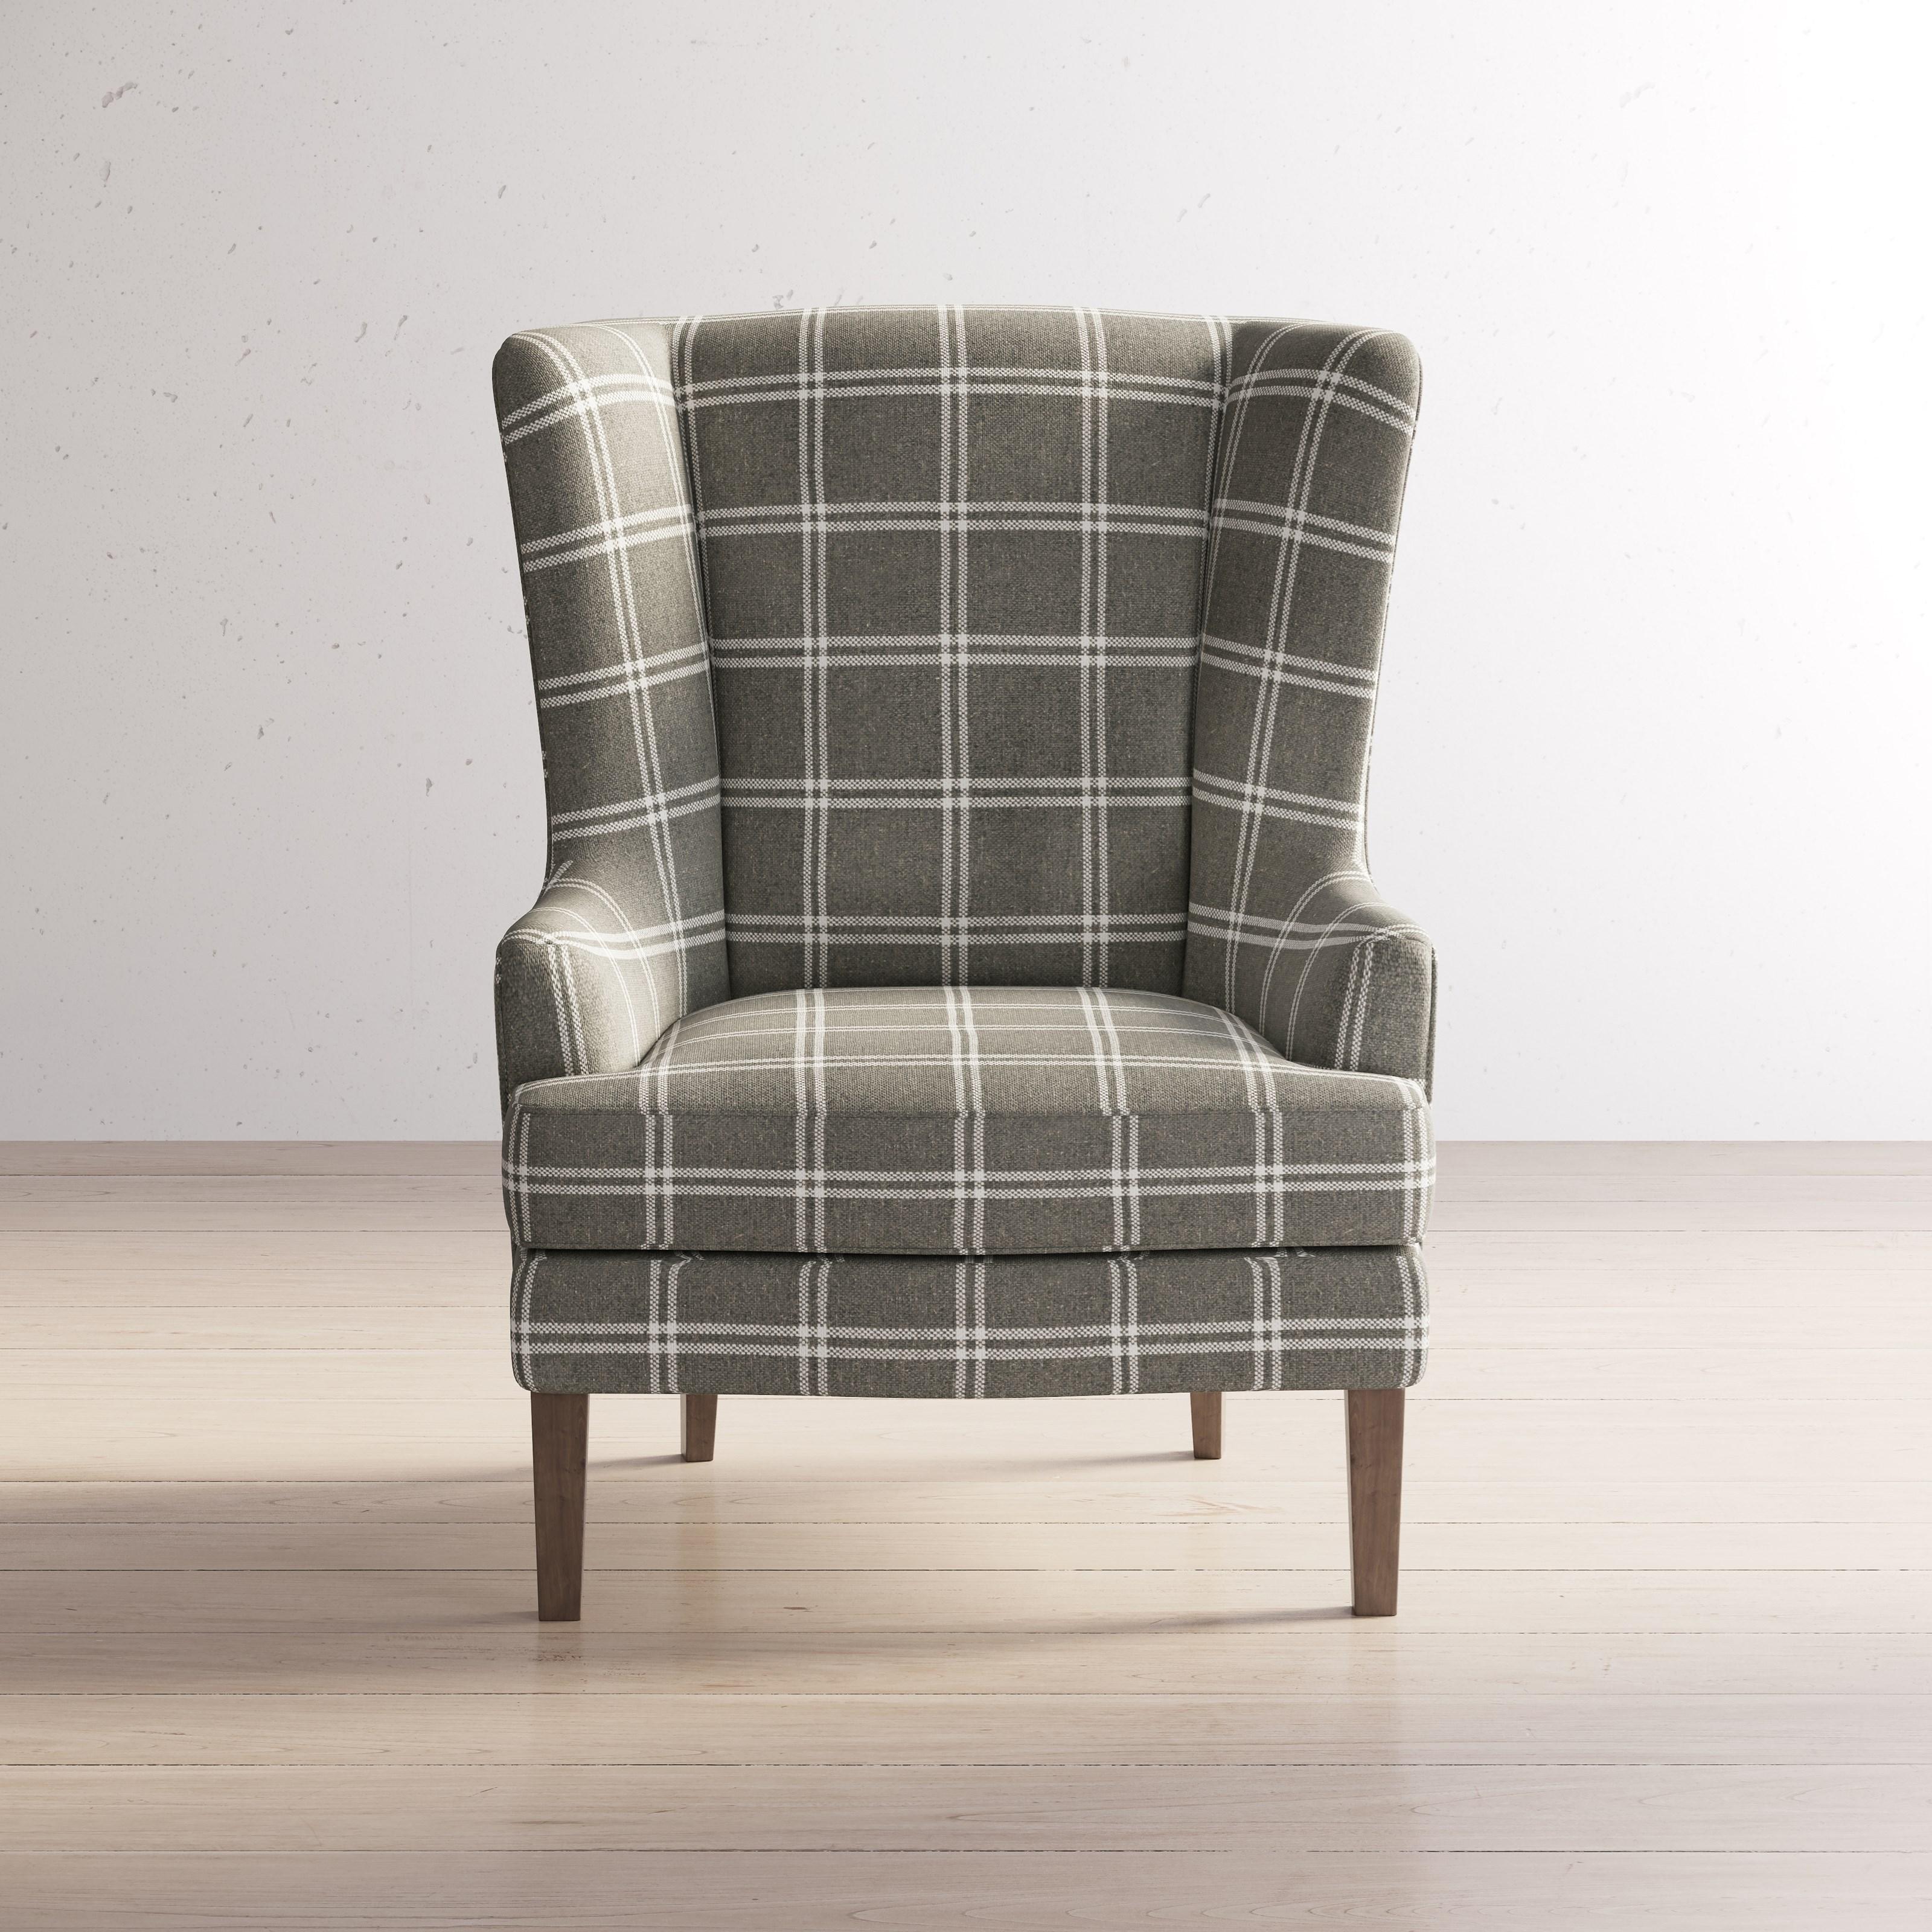 Lacroix Lacroix Chair by Jofran at Jofran